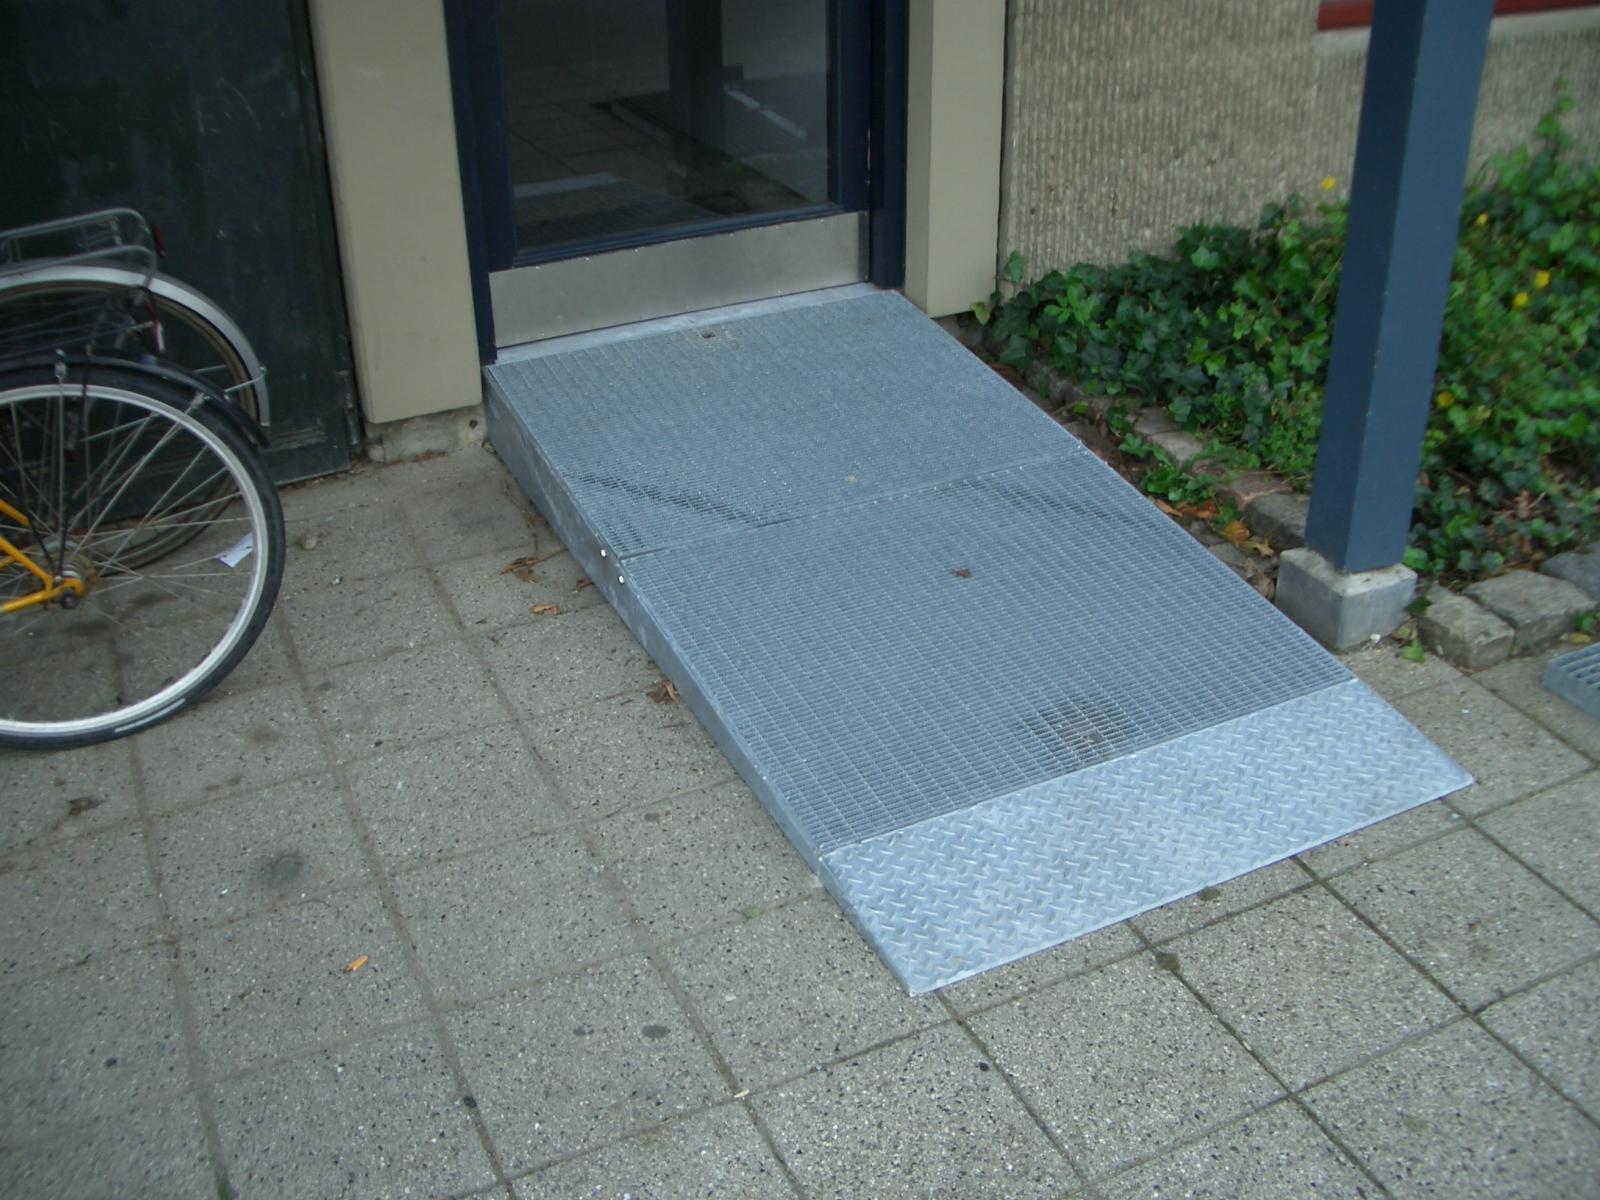 indgangs_rampe_handicap-koerestol_2704